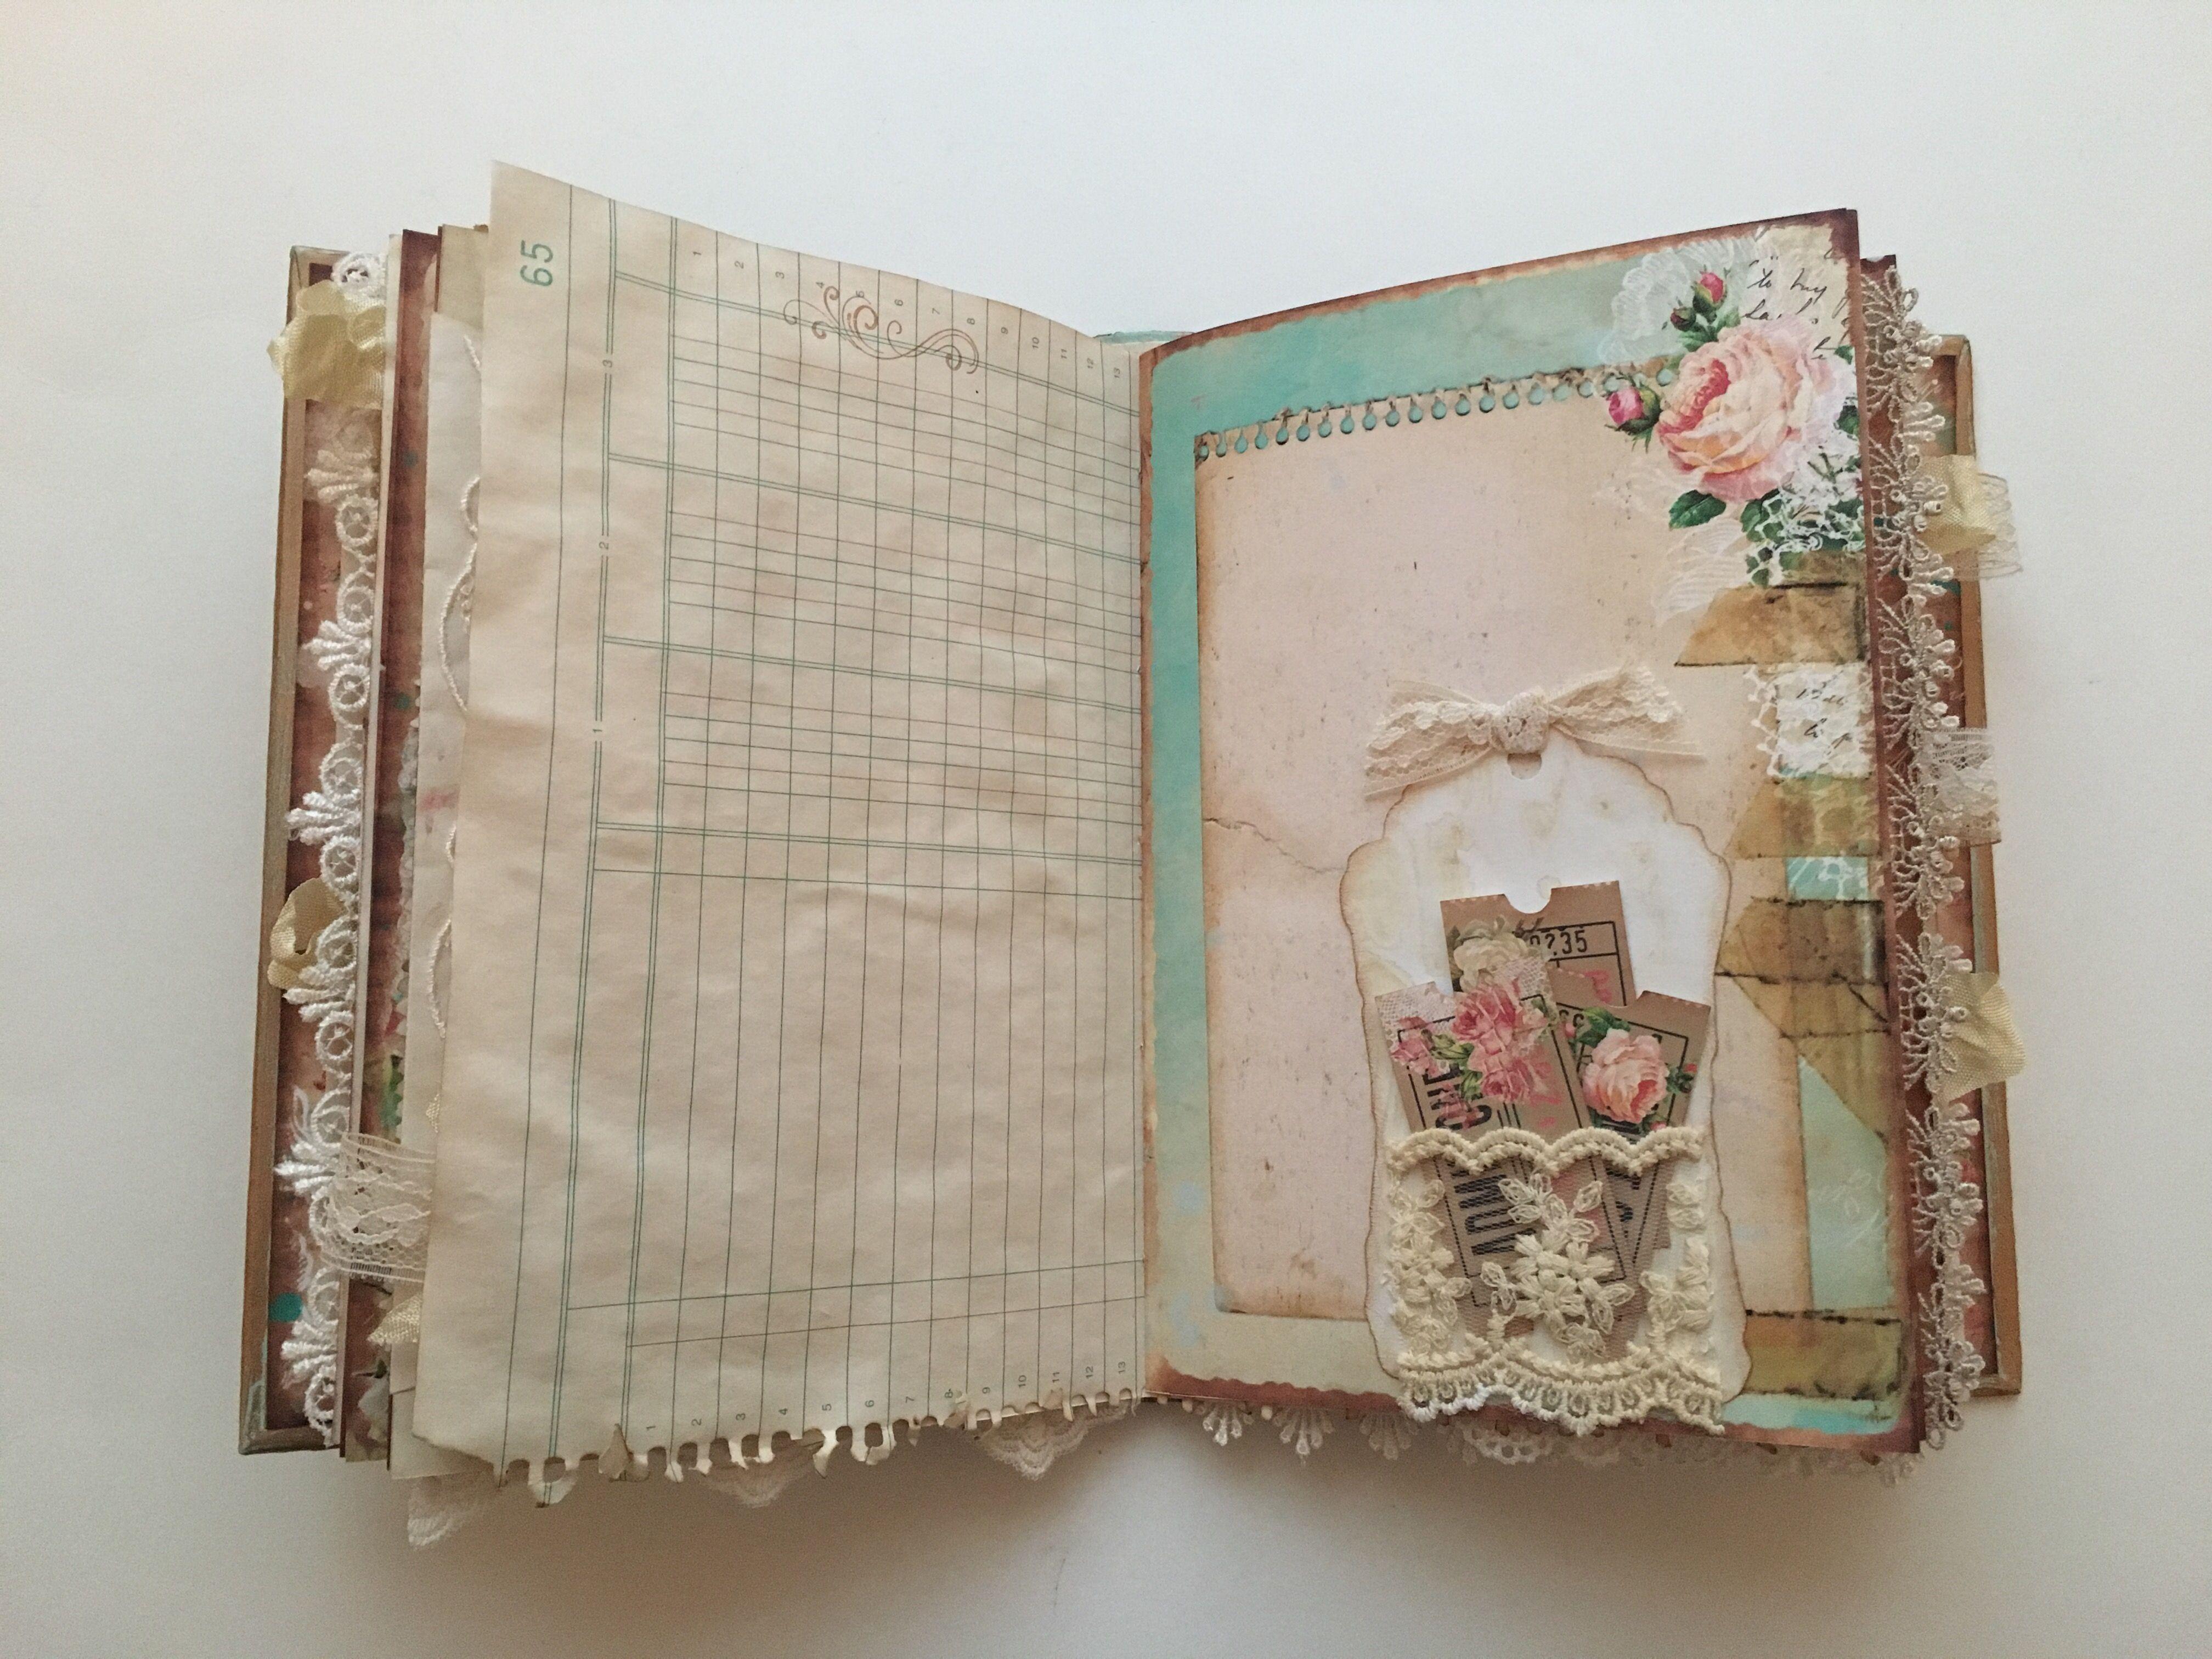 Vintage Journal Vintage Journal Art Journal Inspiration Handmade Journals